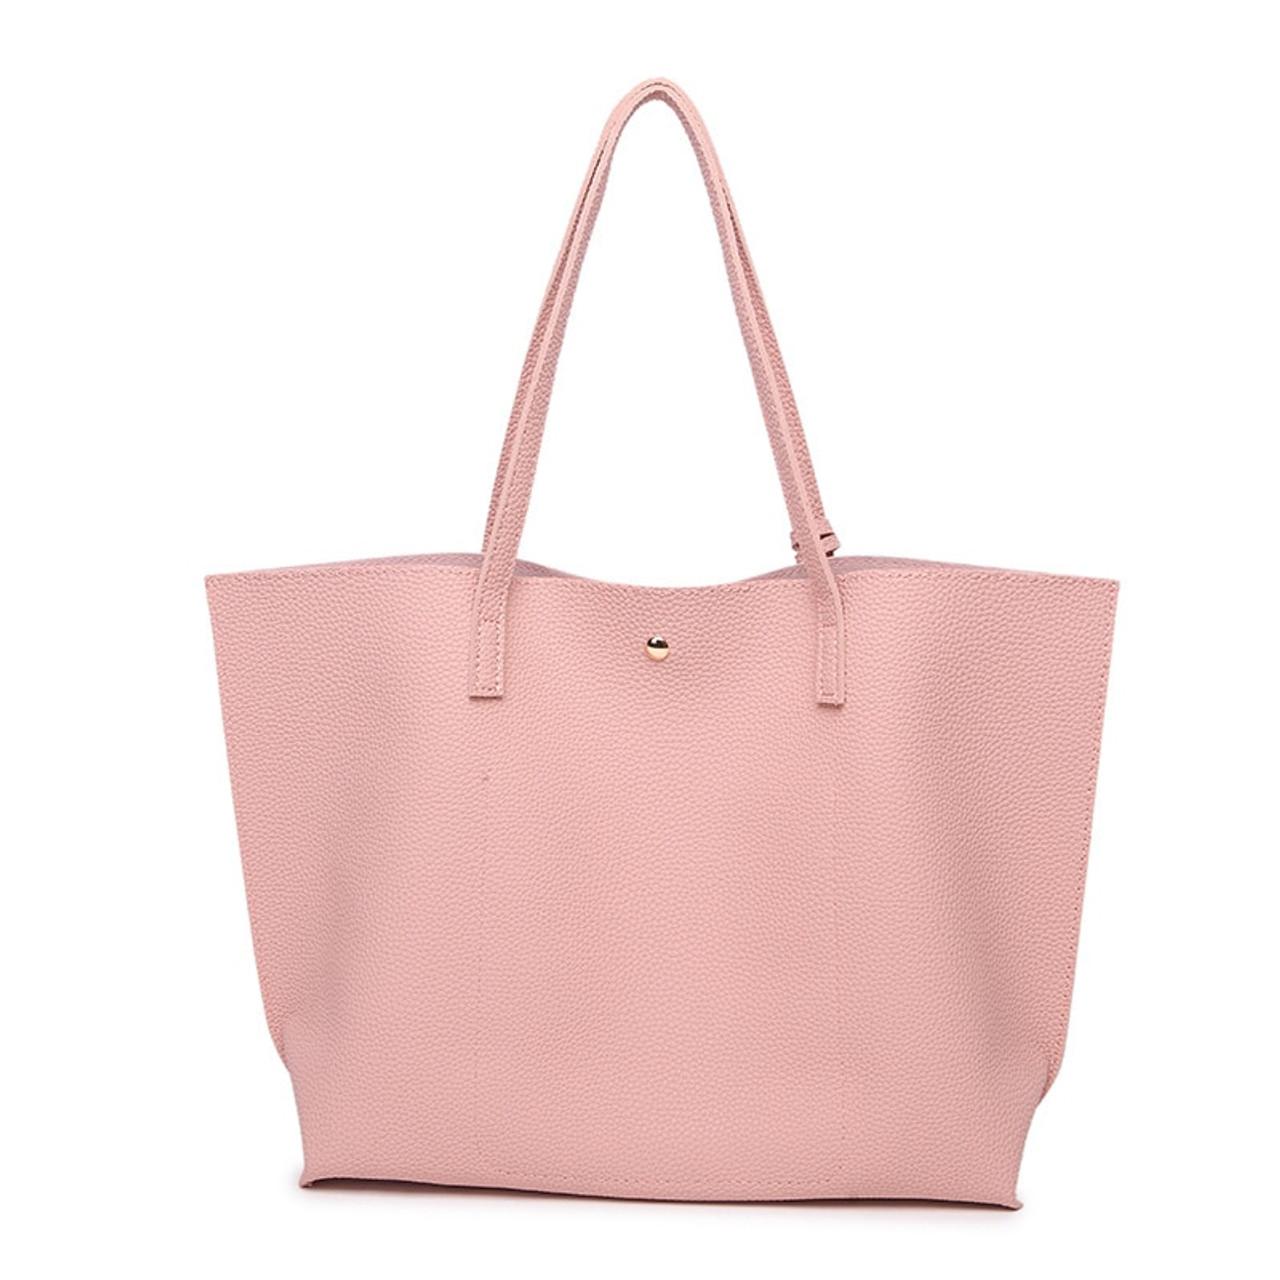 ... Women Messenger Bags Leather Casual Tassel Handbags Female Designer Bag  Vintage Big Size Tote Shoulder Bag ... ed32777faacbf